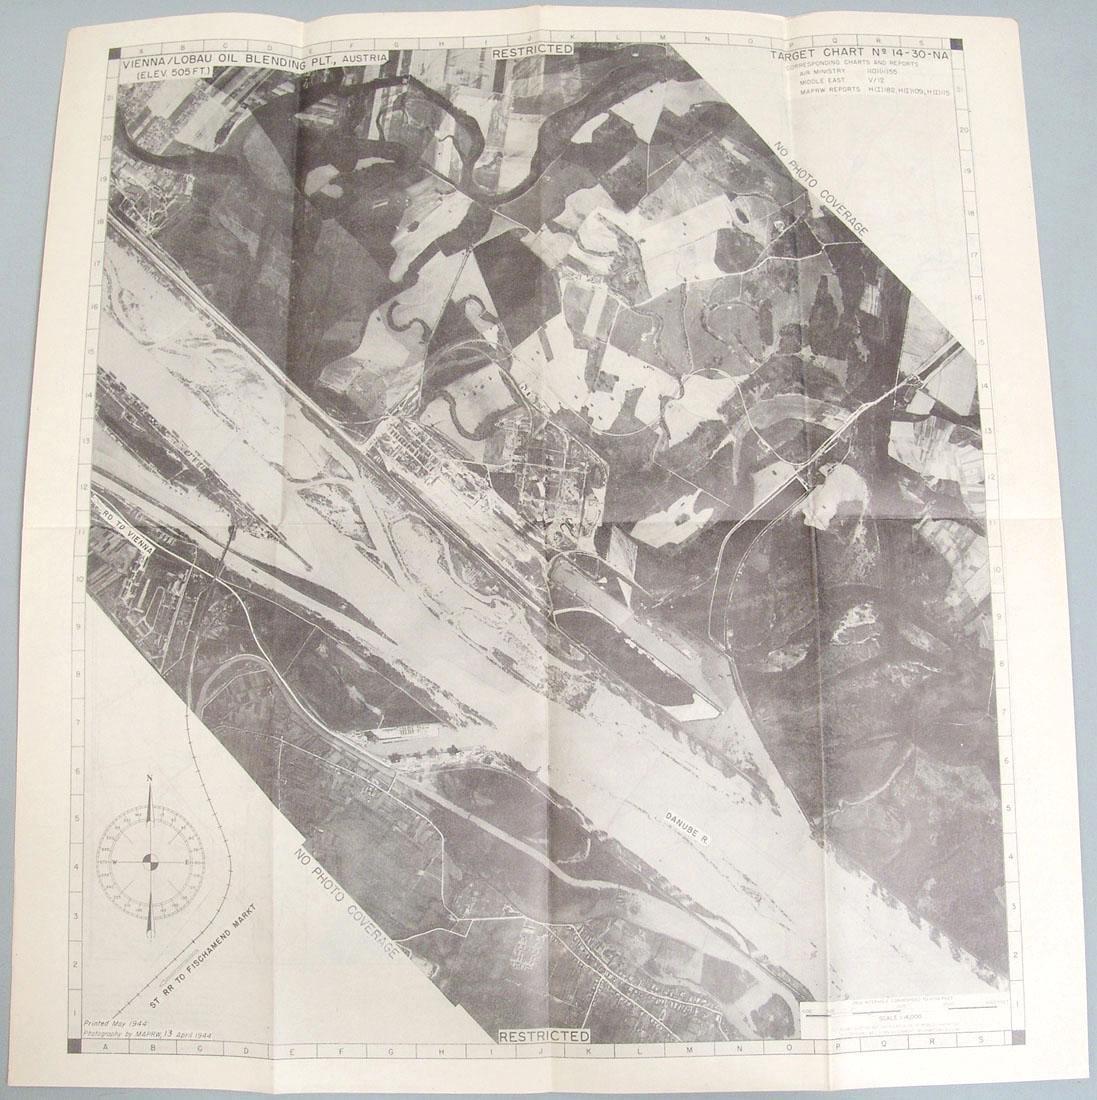 Original 1944 WWII Allied Bombing Map - Austria - 2